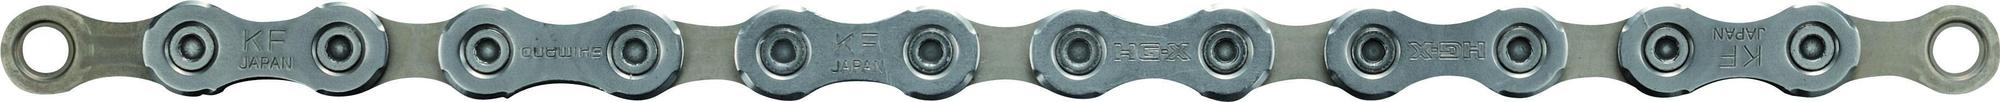 Shimano Kette SLX CN-HG75 10-fach 116 Glieder